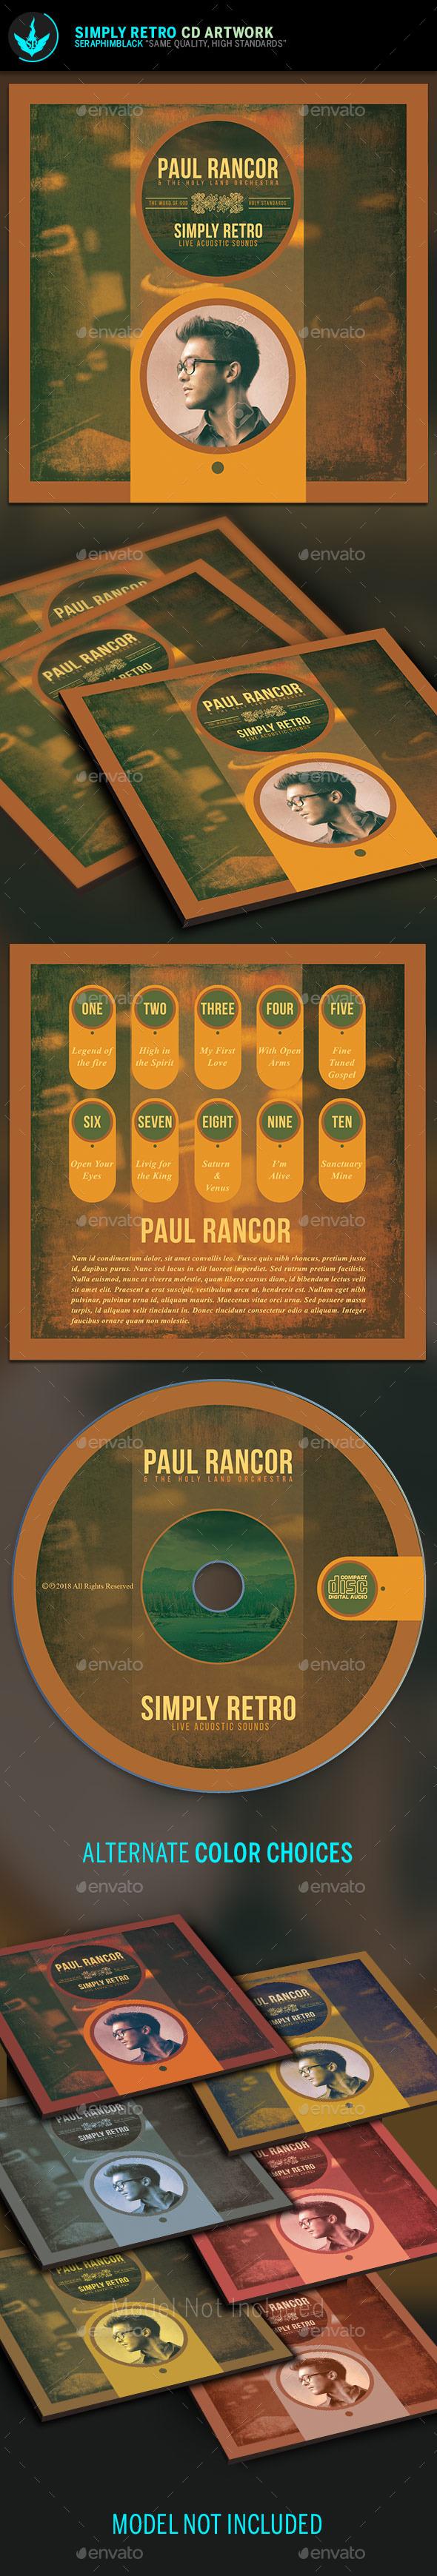 Simply Retro CD Artwork Template - CD & DVD Artwork Print Templates